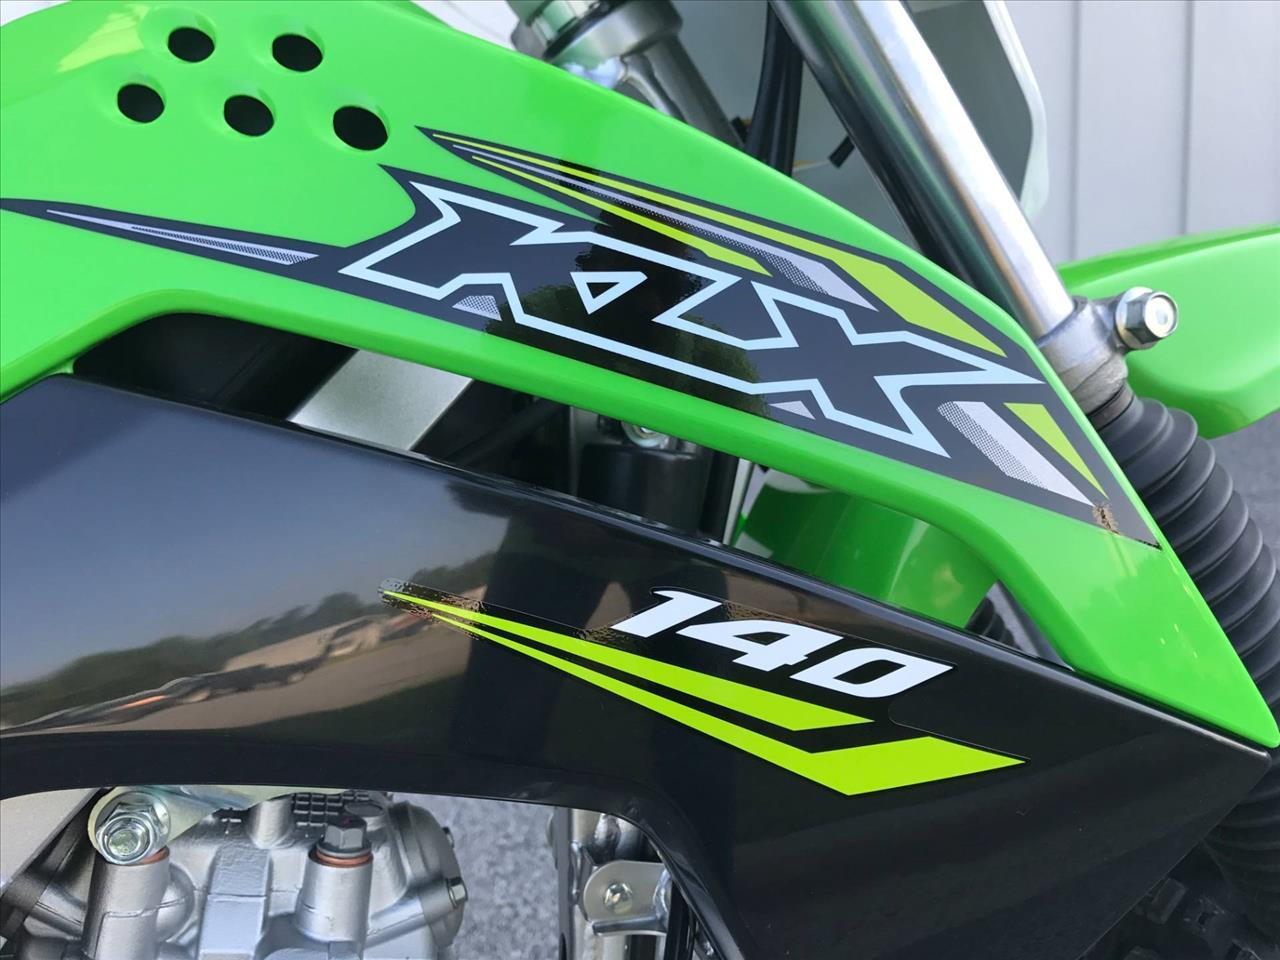 2018 Kawasaki KLX 140 for sale at Vehicle Network, LLC - Ron Ayers Motorsports in Greenville NC